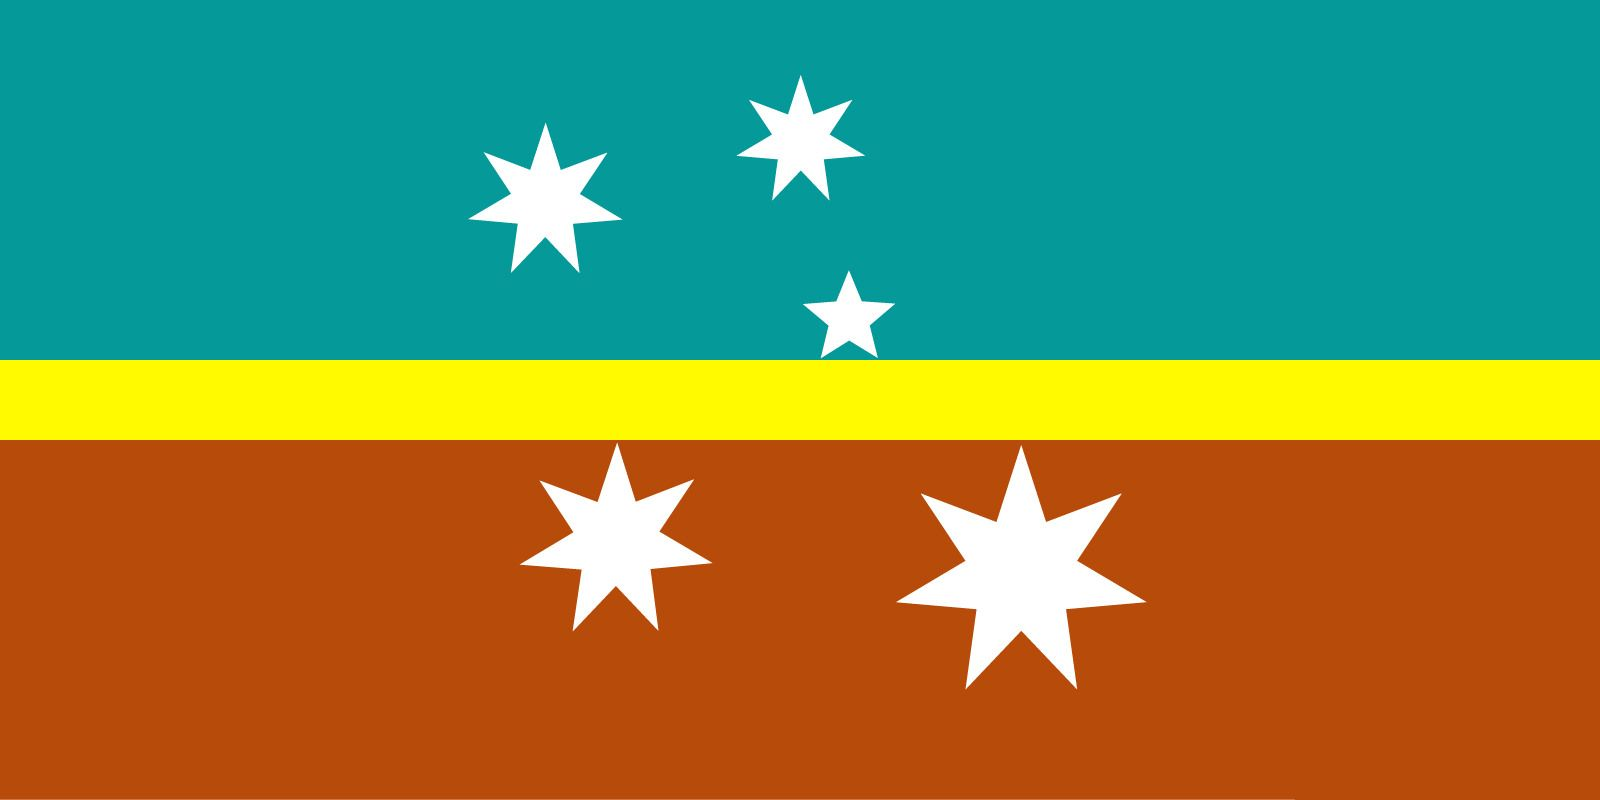 New Australian Flag Design UluruSky Golden Horizon SC/CS5L Turq Ochre 2018  1:2